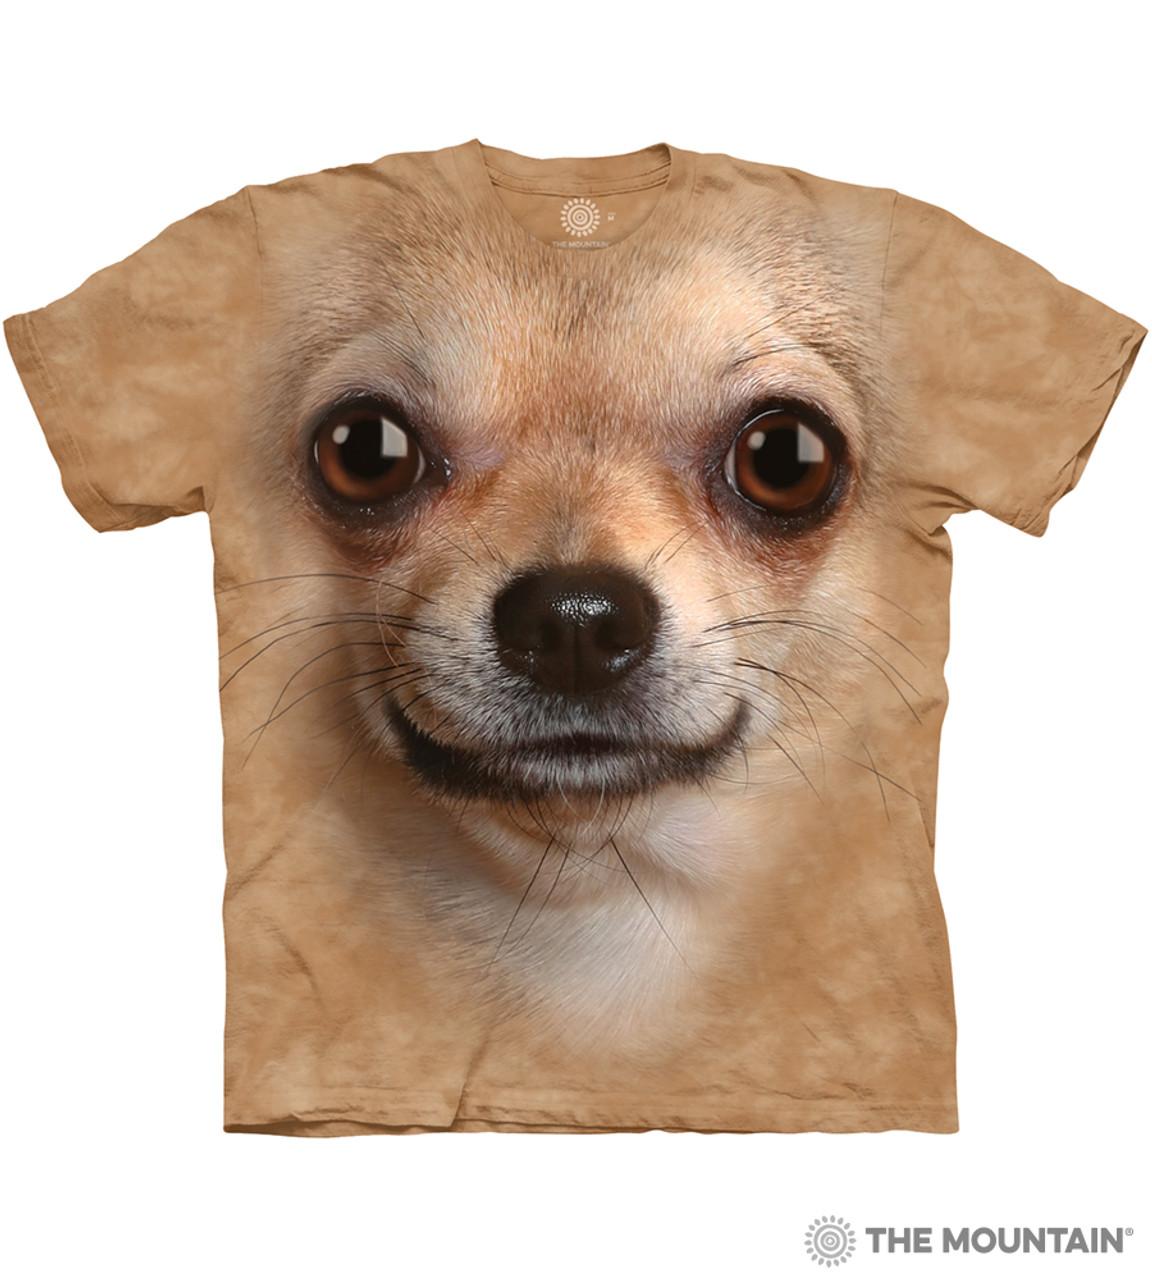 Handbag Chihuahua Kids T-Shirt from The Mountain Cute Dog Children/'s Tees NEW